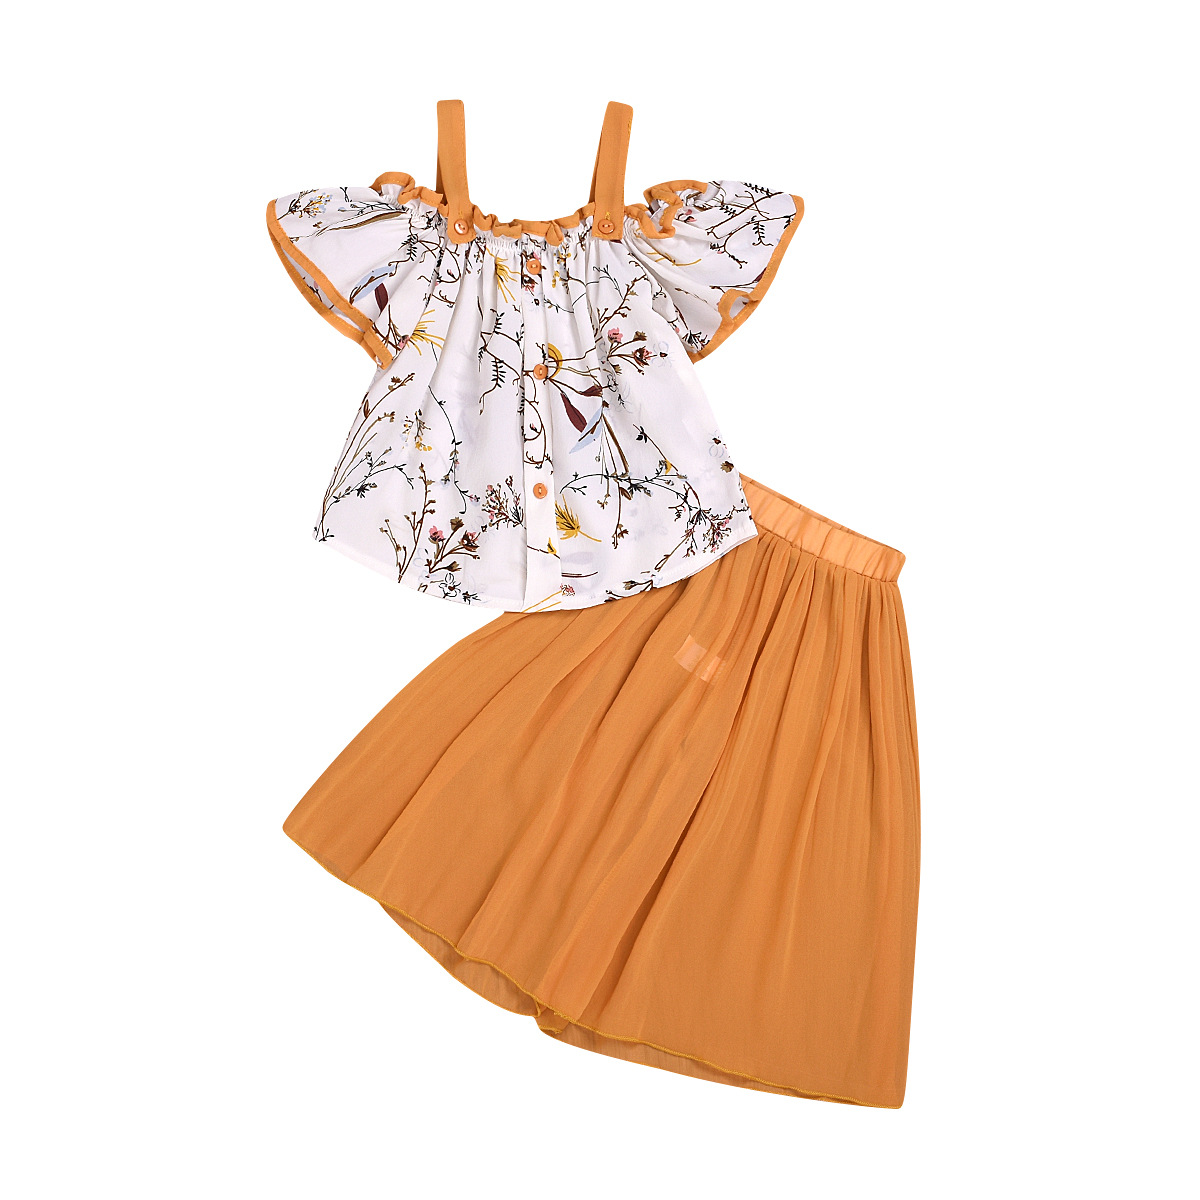 Children's Clothing Summer 2020 Girls Strap Tassel Top Flared Pants Suit D09.29 3